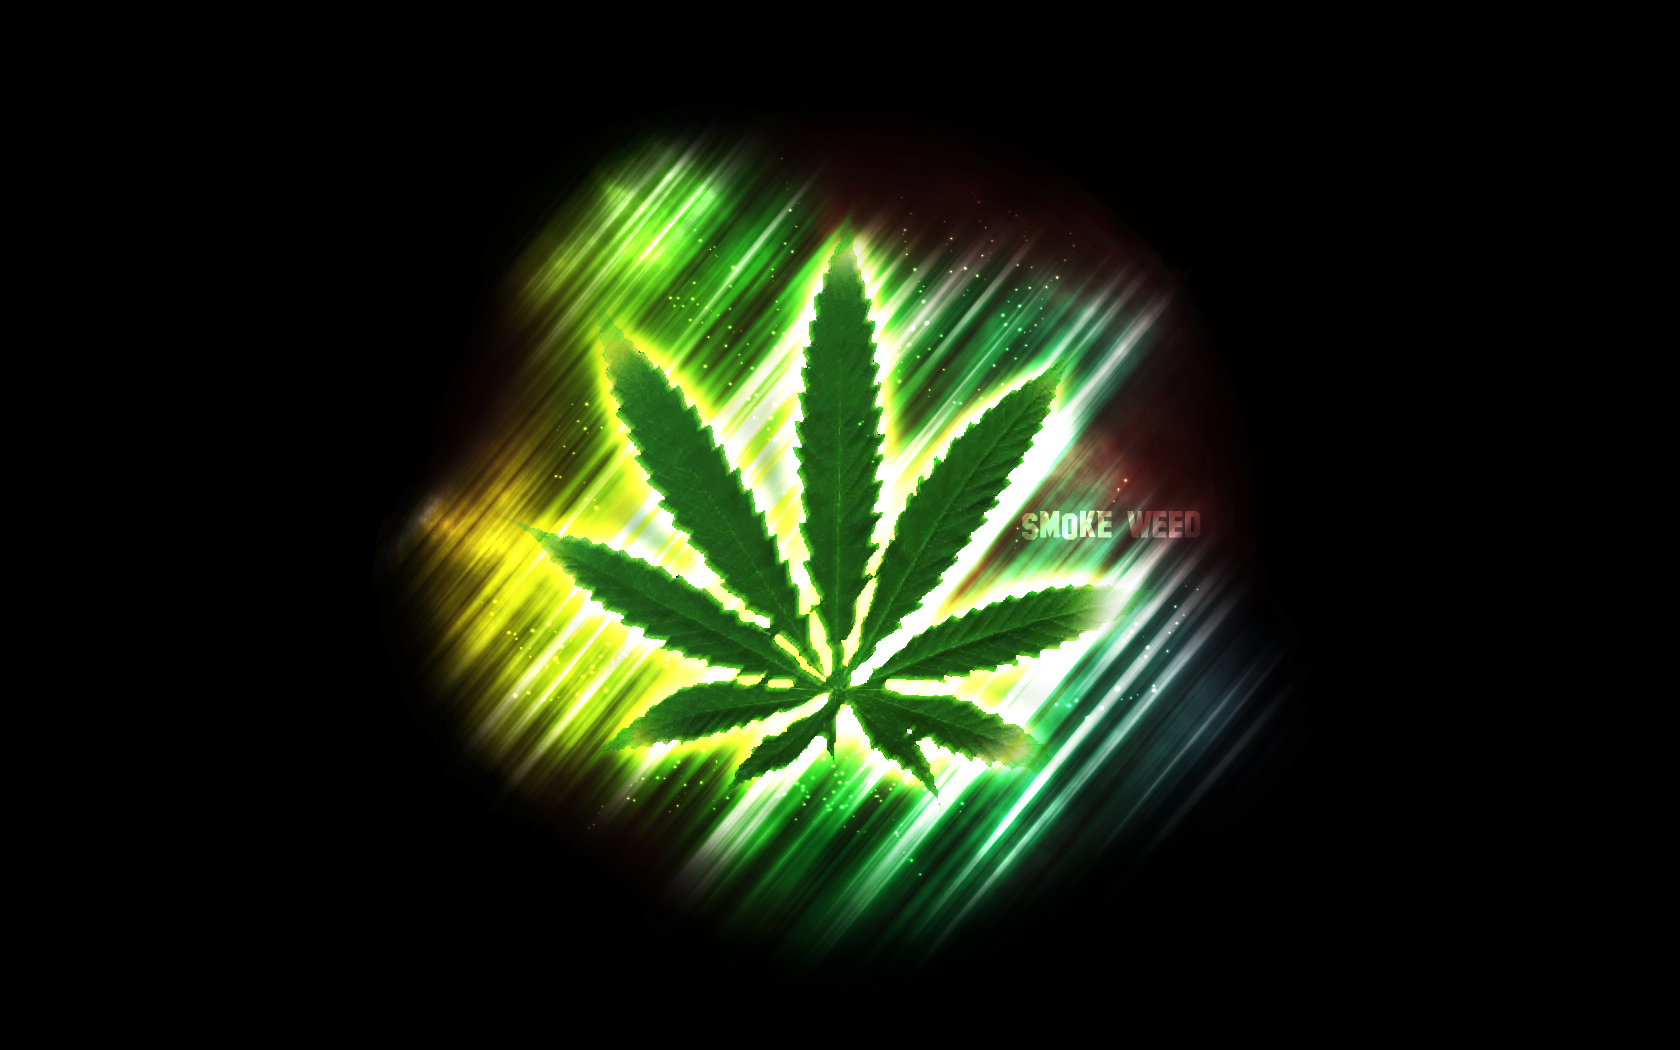 Consistency Quotes Wallpaper 13 Psd Smoke Weed Images Marijuana Smoke Weed Smoke